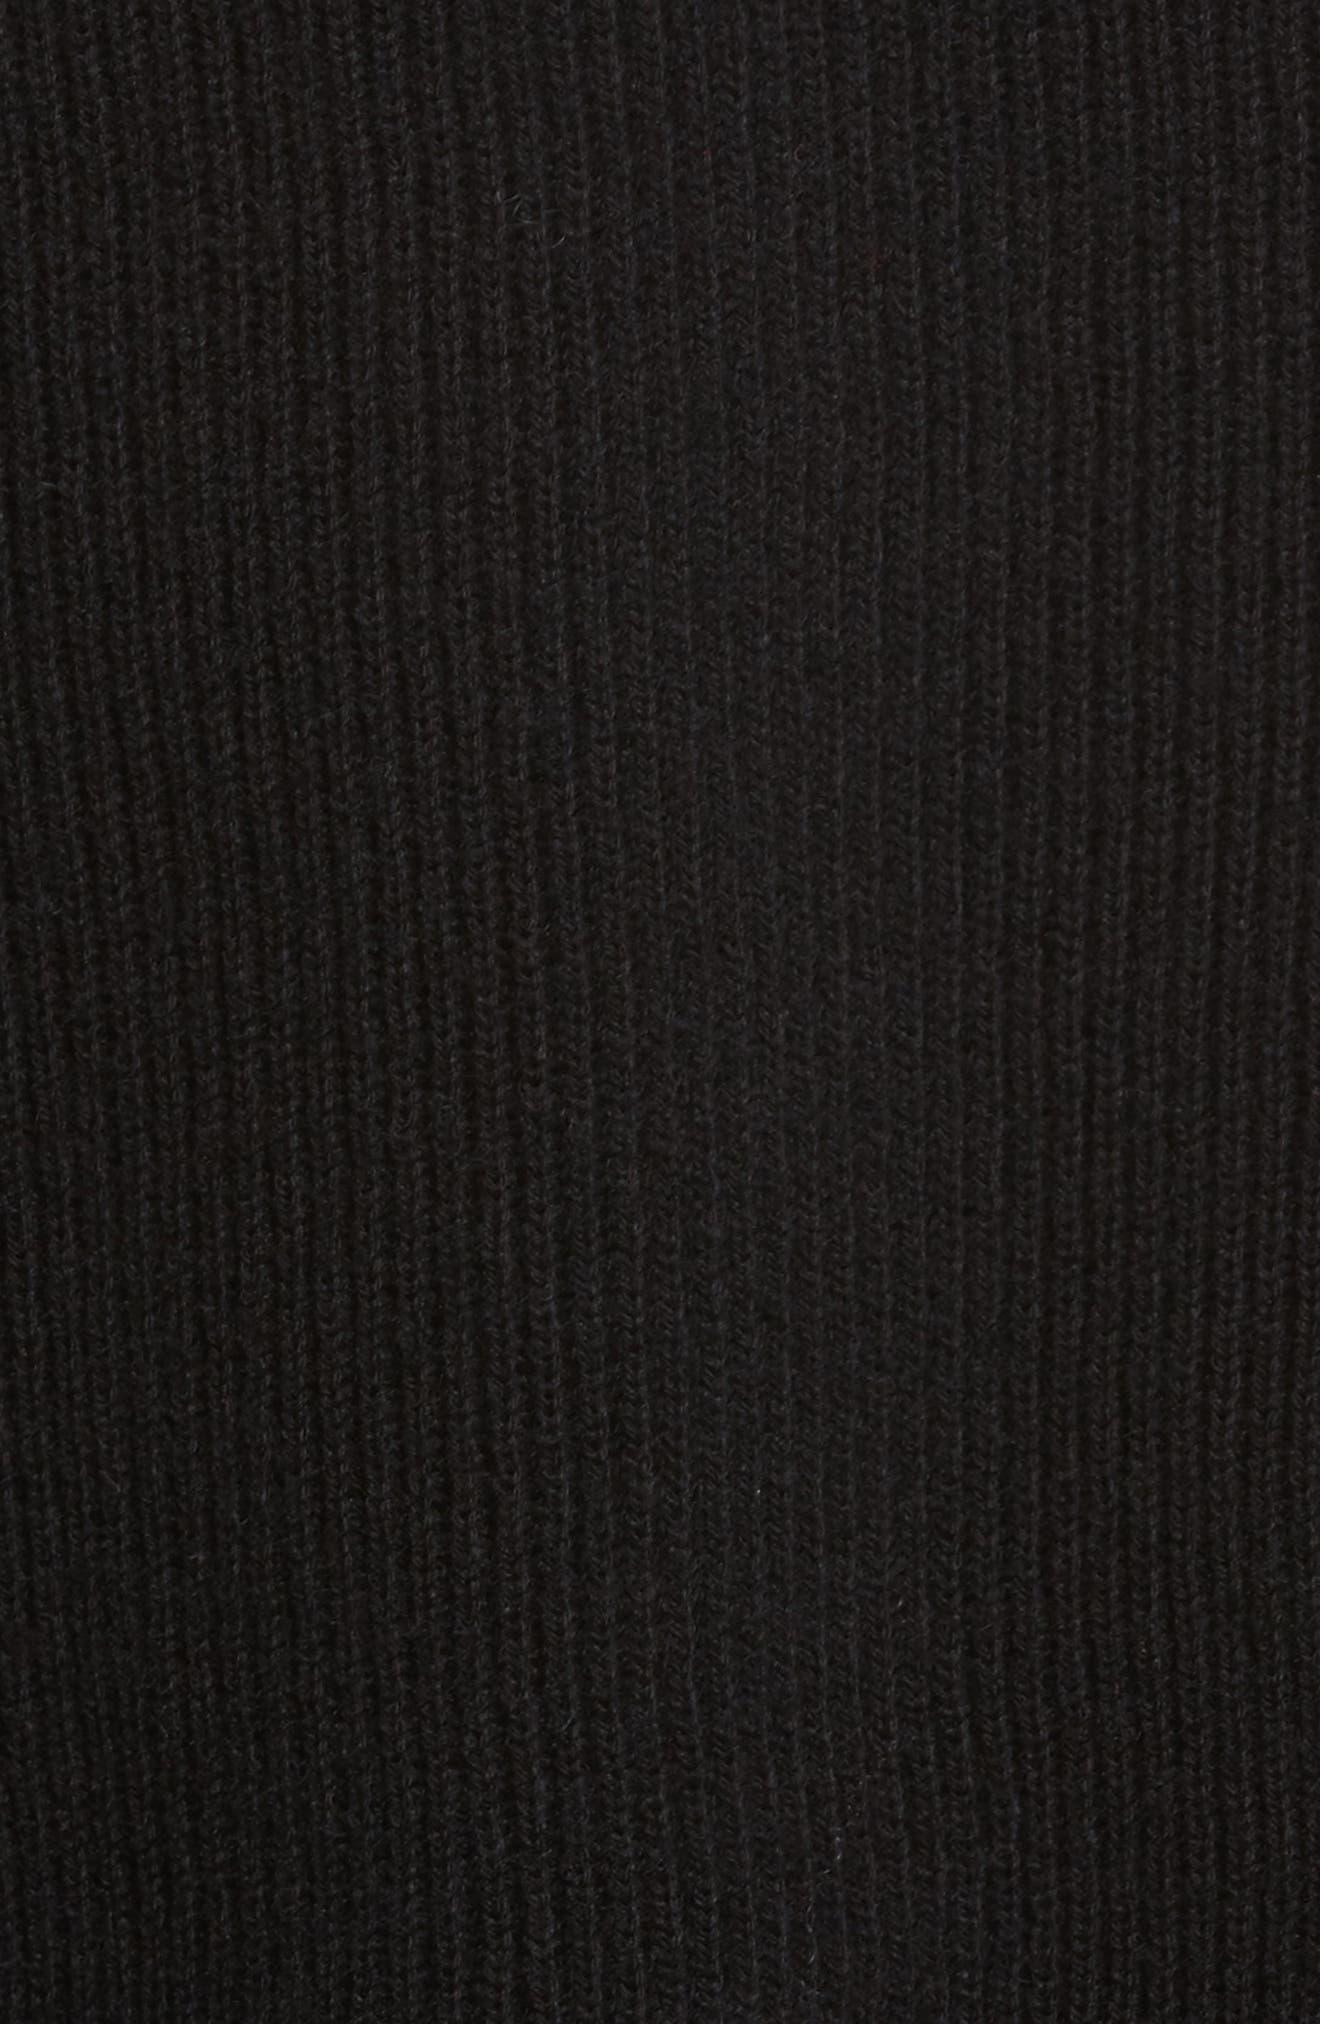 Distressed V-Neck Sweater,                             Alternate thumbnail 5, color,                             Black